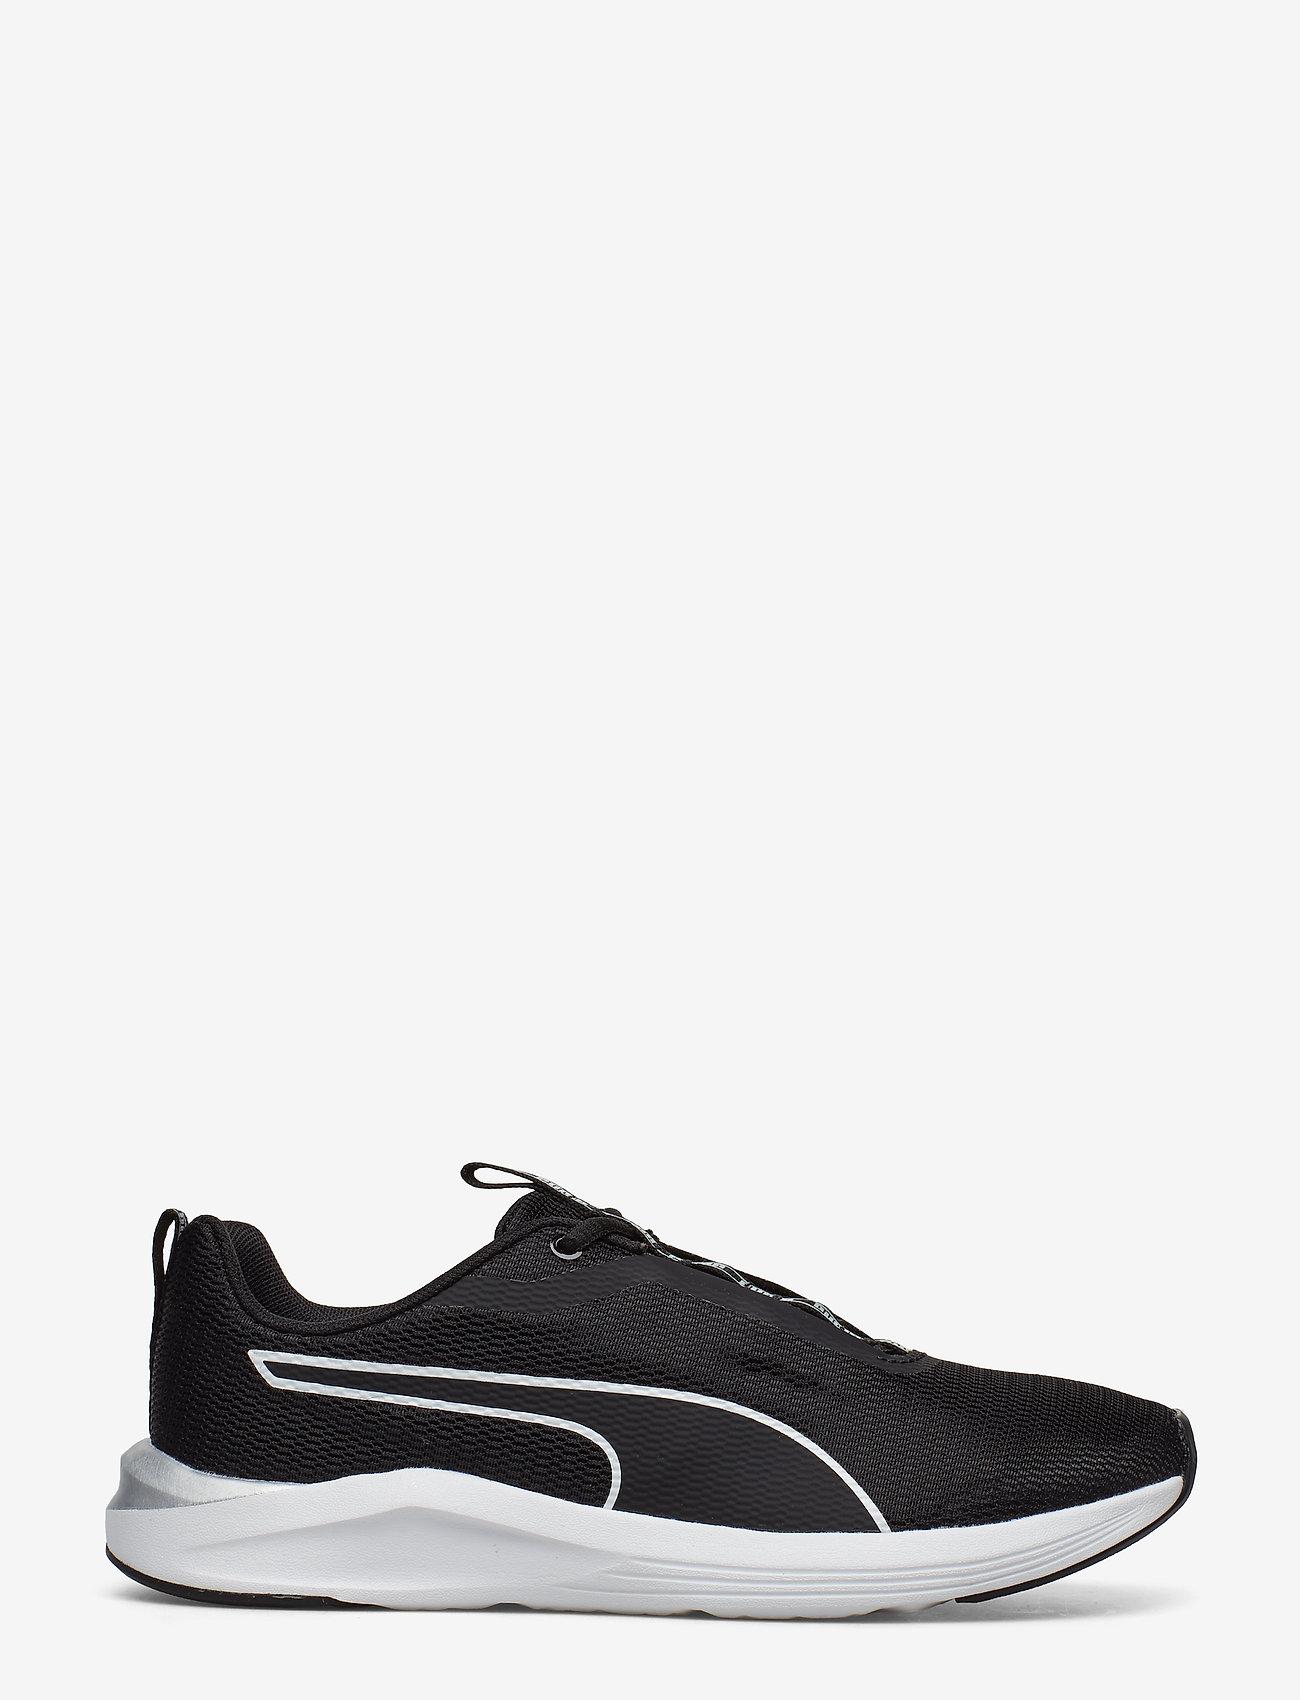 PUMA - Prowl 2 Wn's - training shoes - puma black-puma white - 1